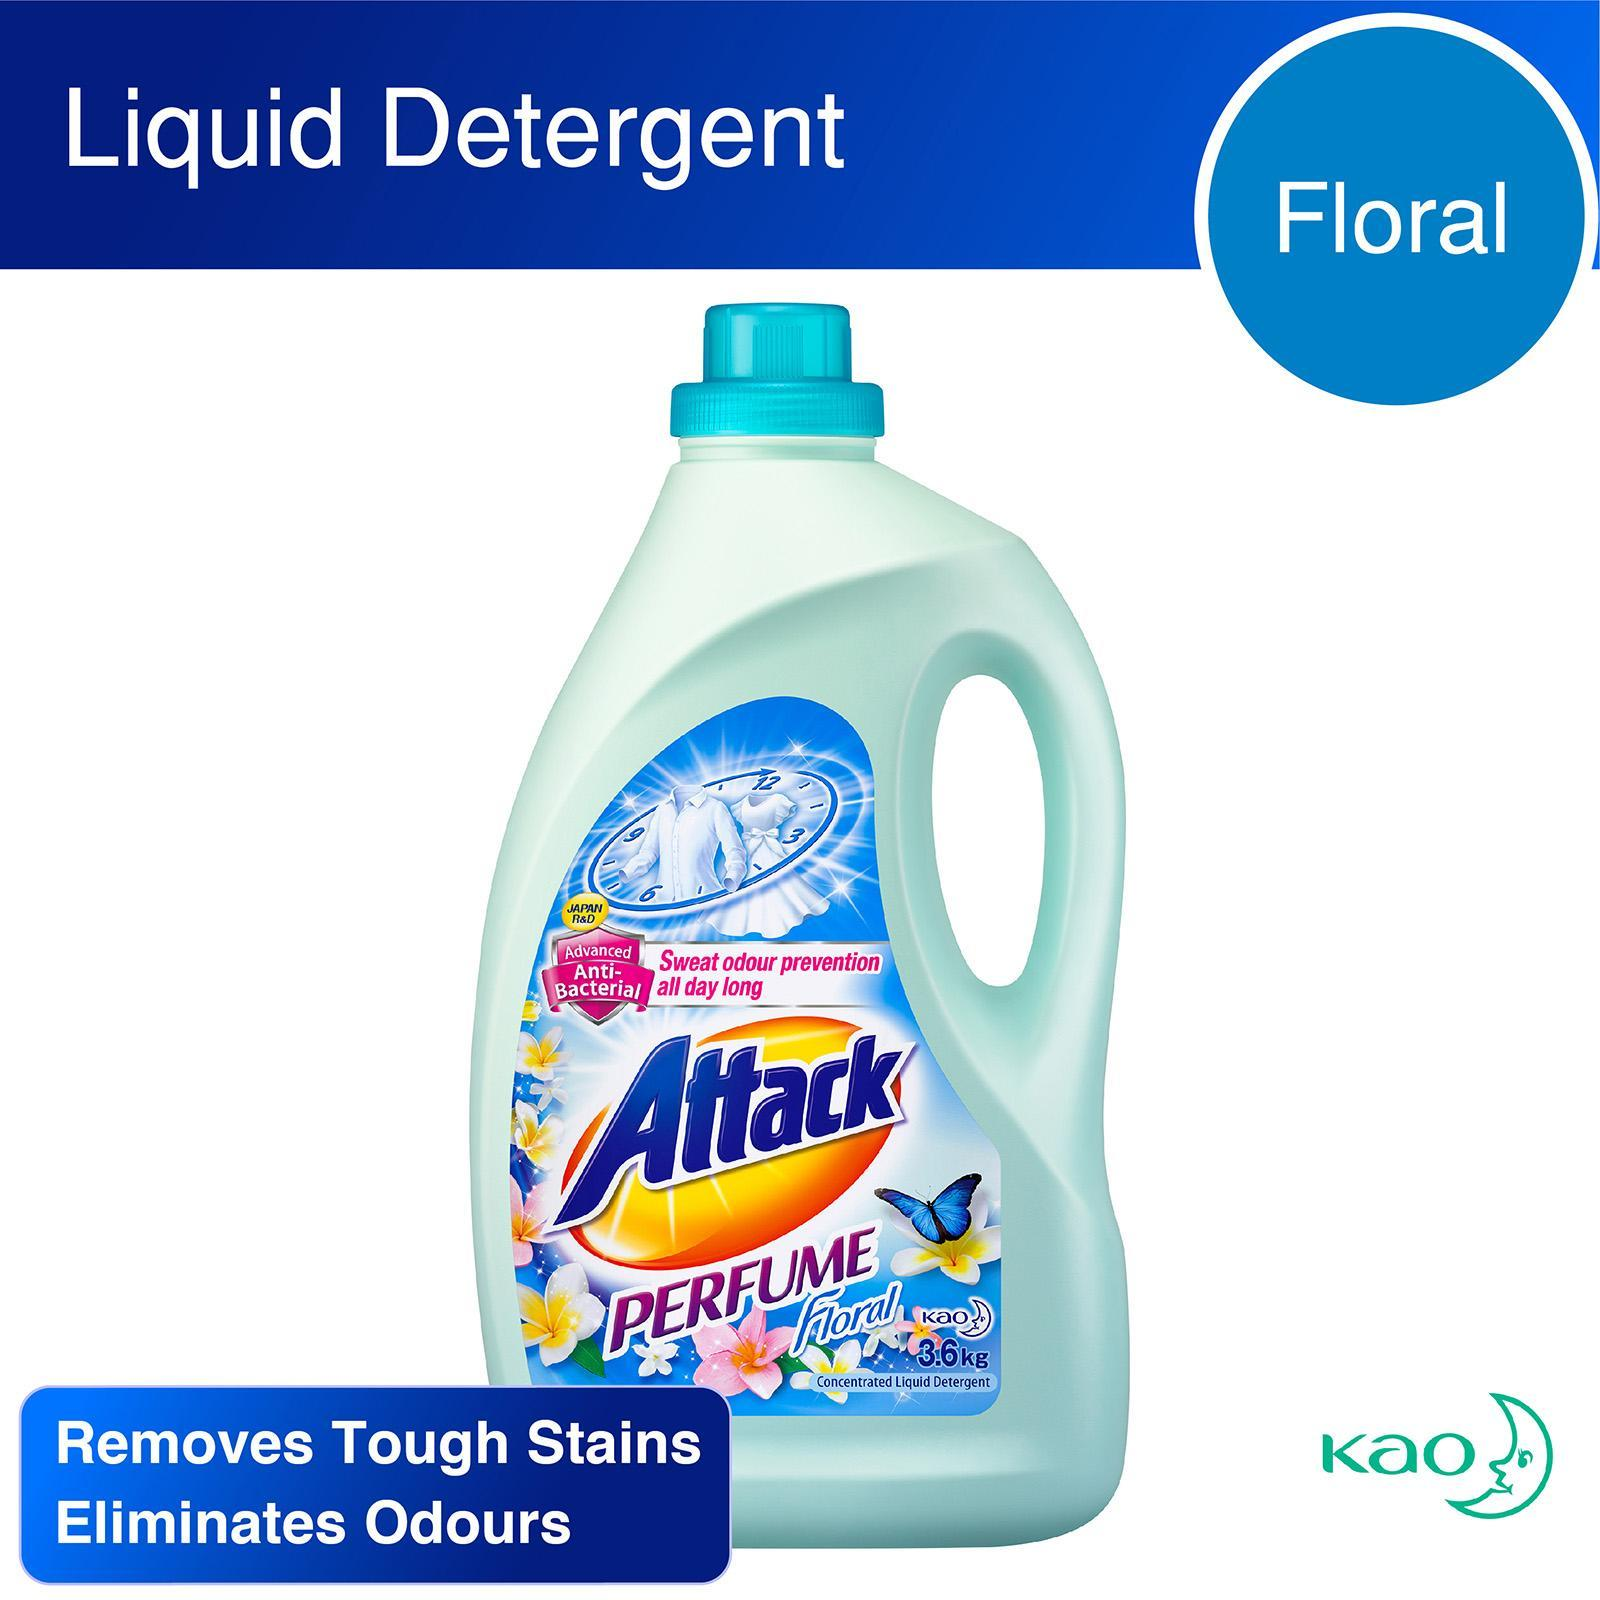 ATTACK Laundry Liquid - Perfume Floral 3.6kg